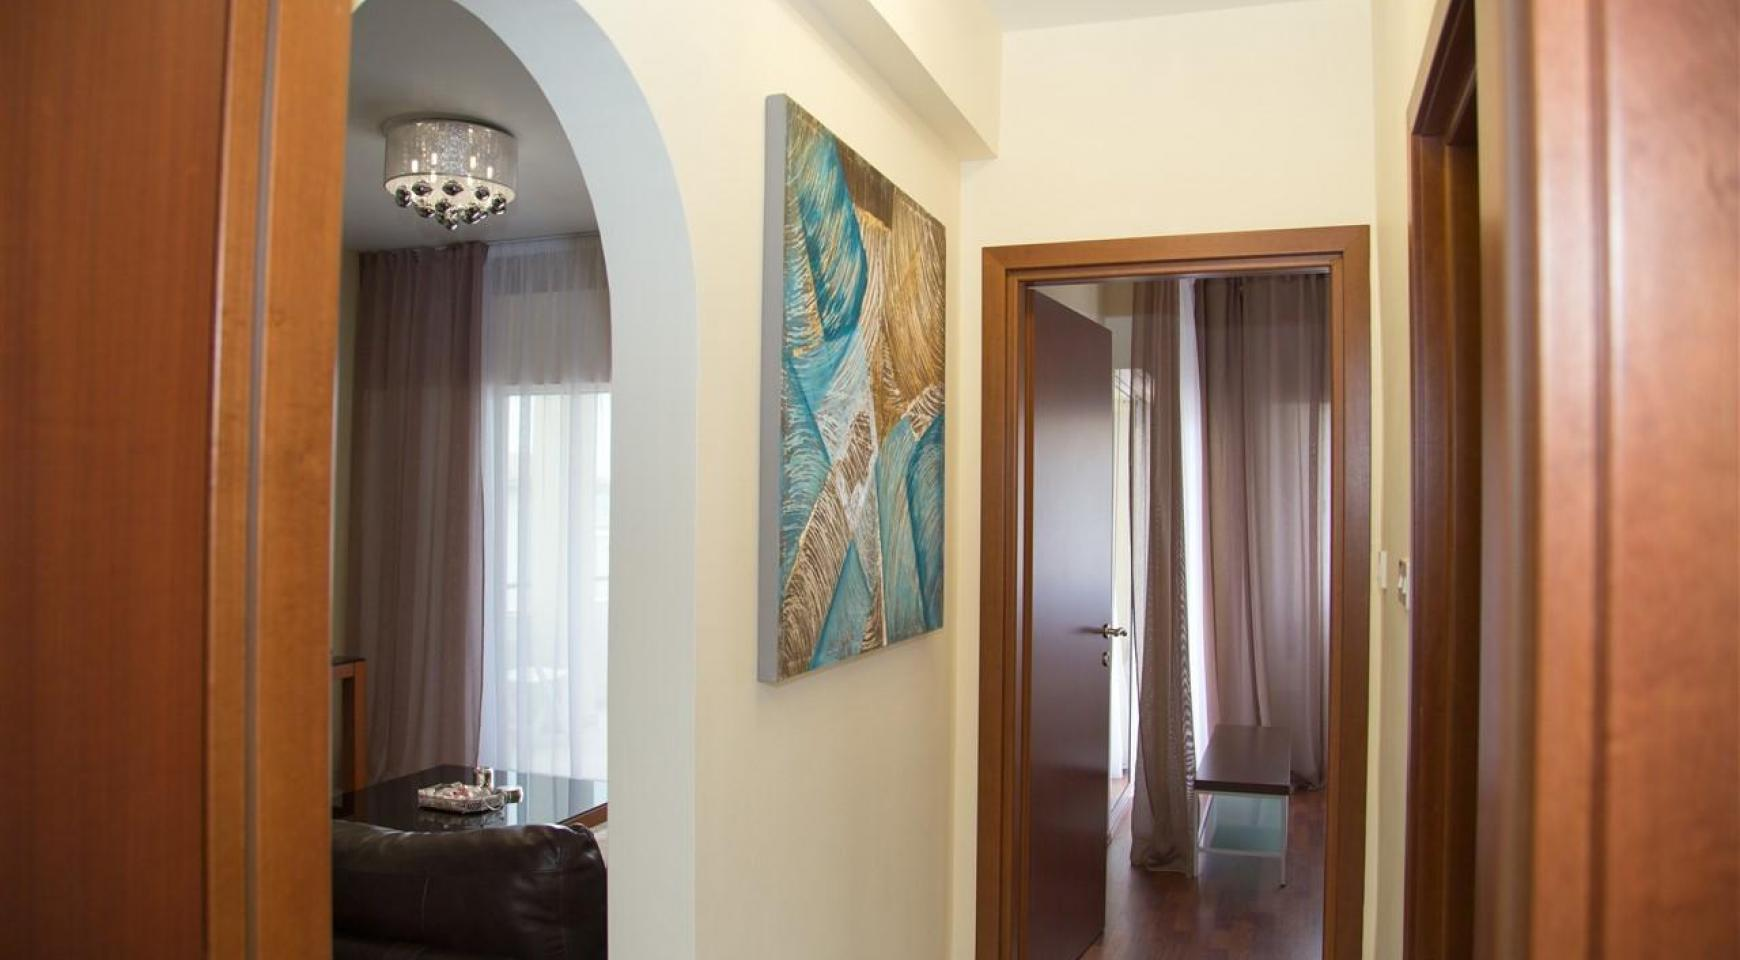 Luxury 2 Bedroom Apartment Mesogios Iris 304 in the Tourist area near the Beach - 13